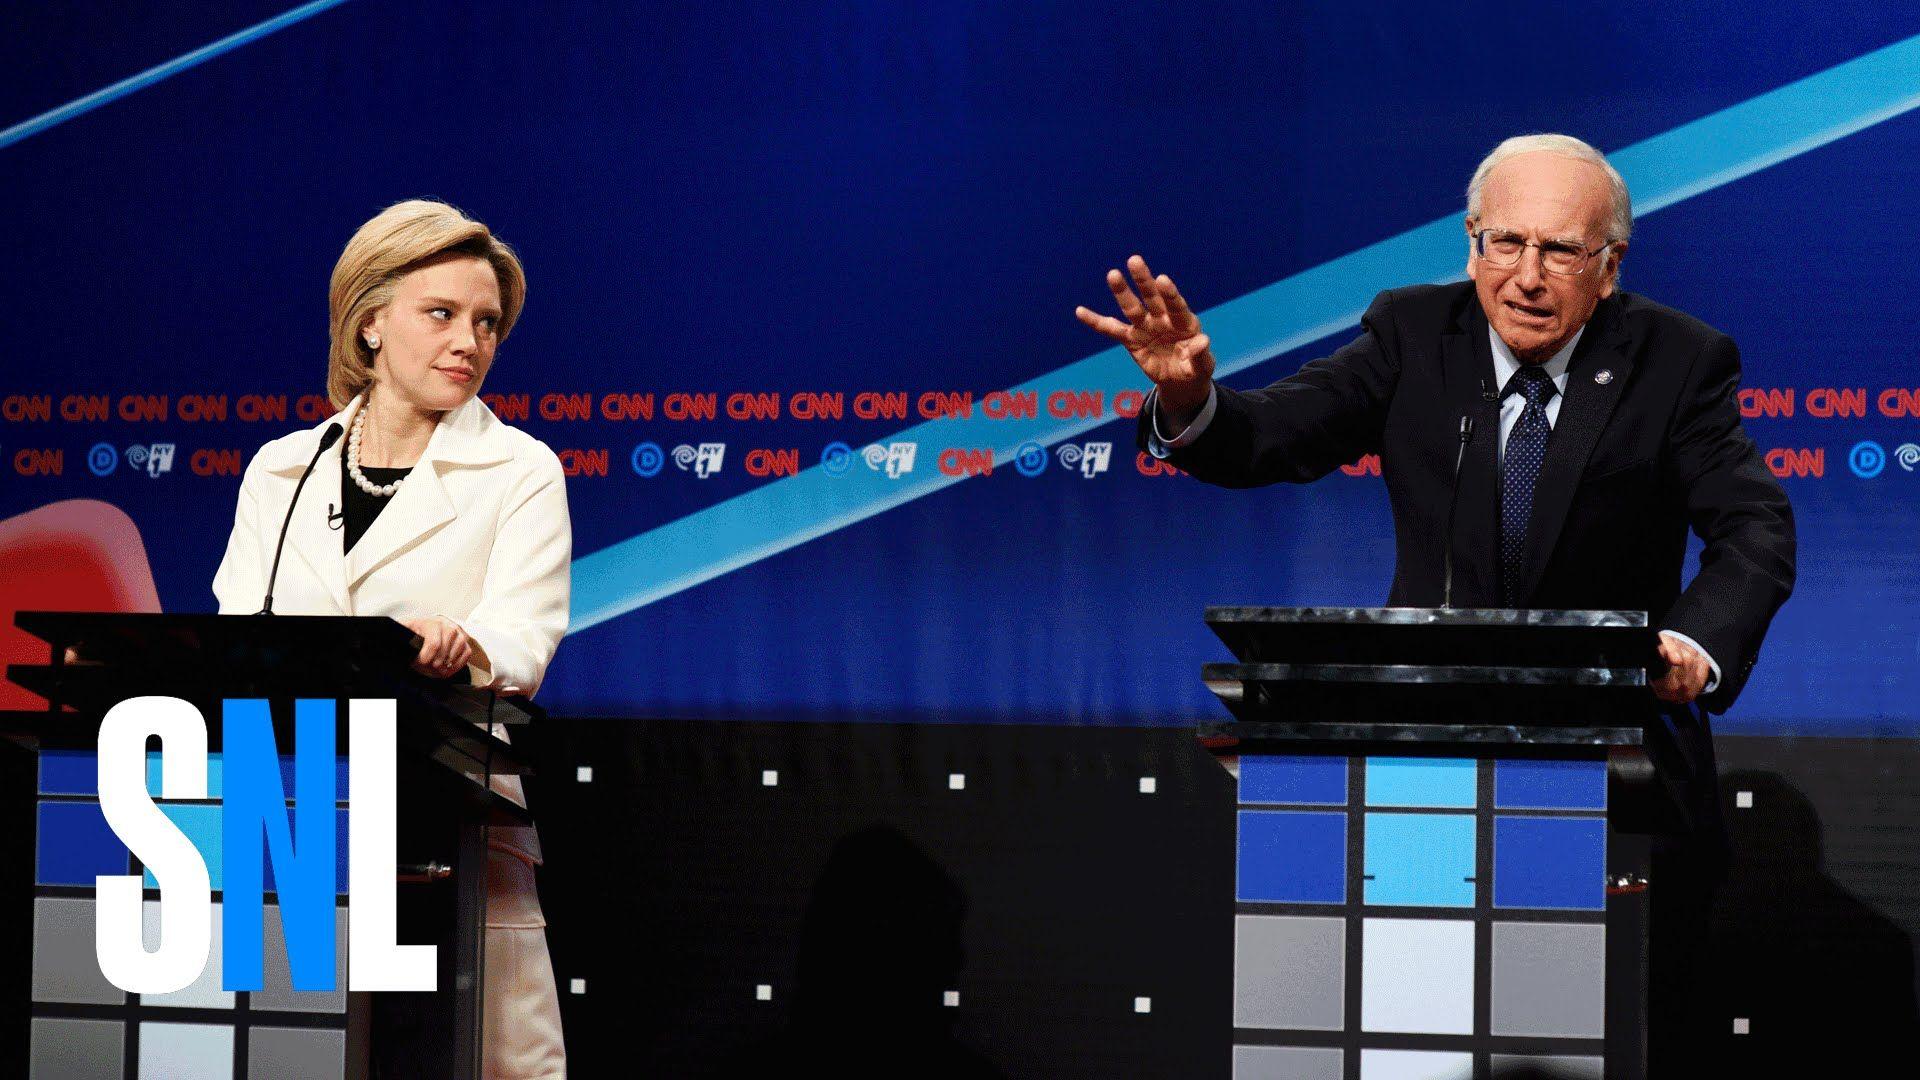 Brooklyn Democratic Debate Cold Open Snl Cold Open Democratic Debate Saturday Night Live